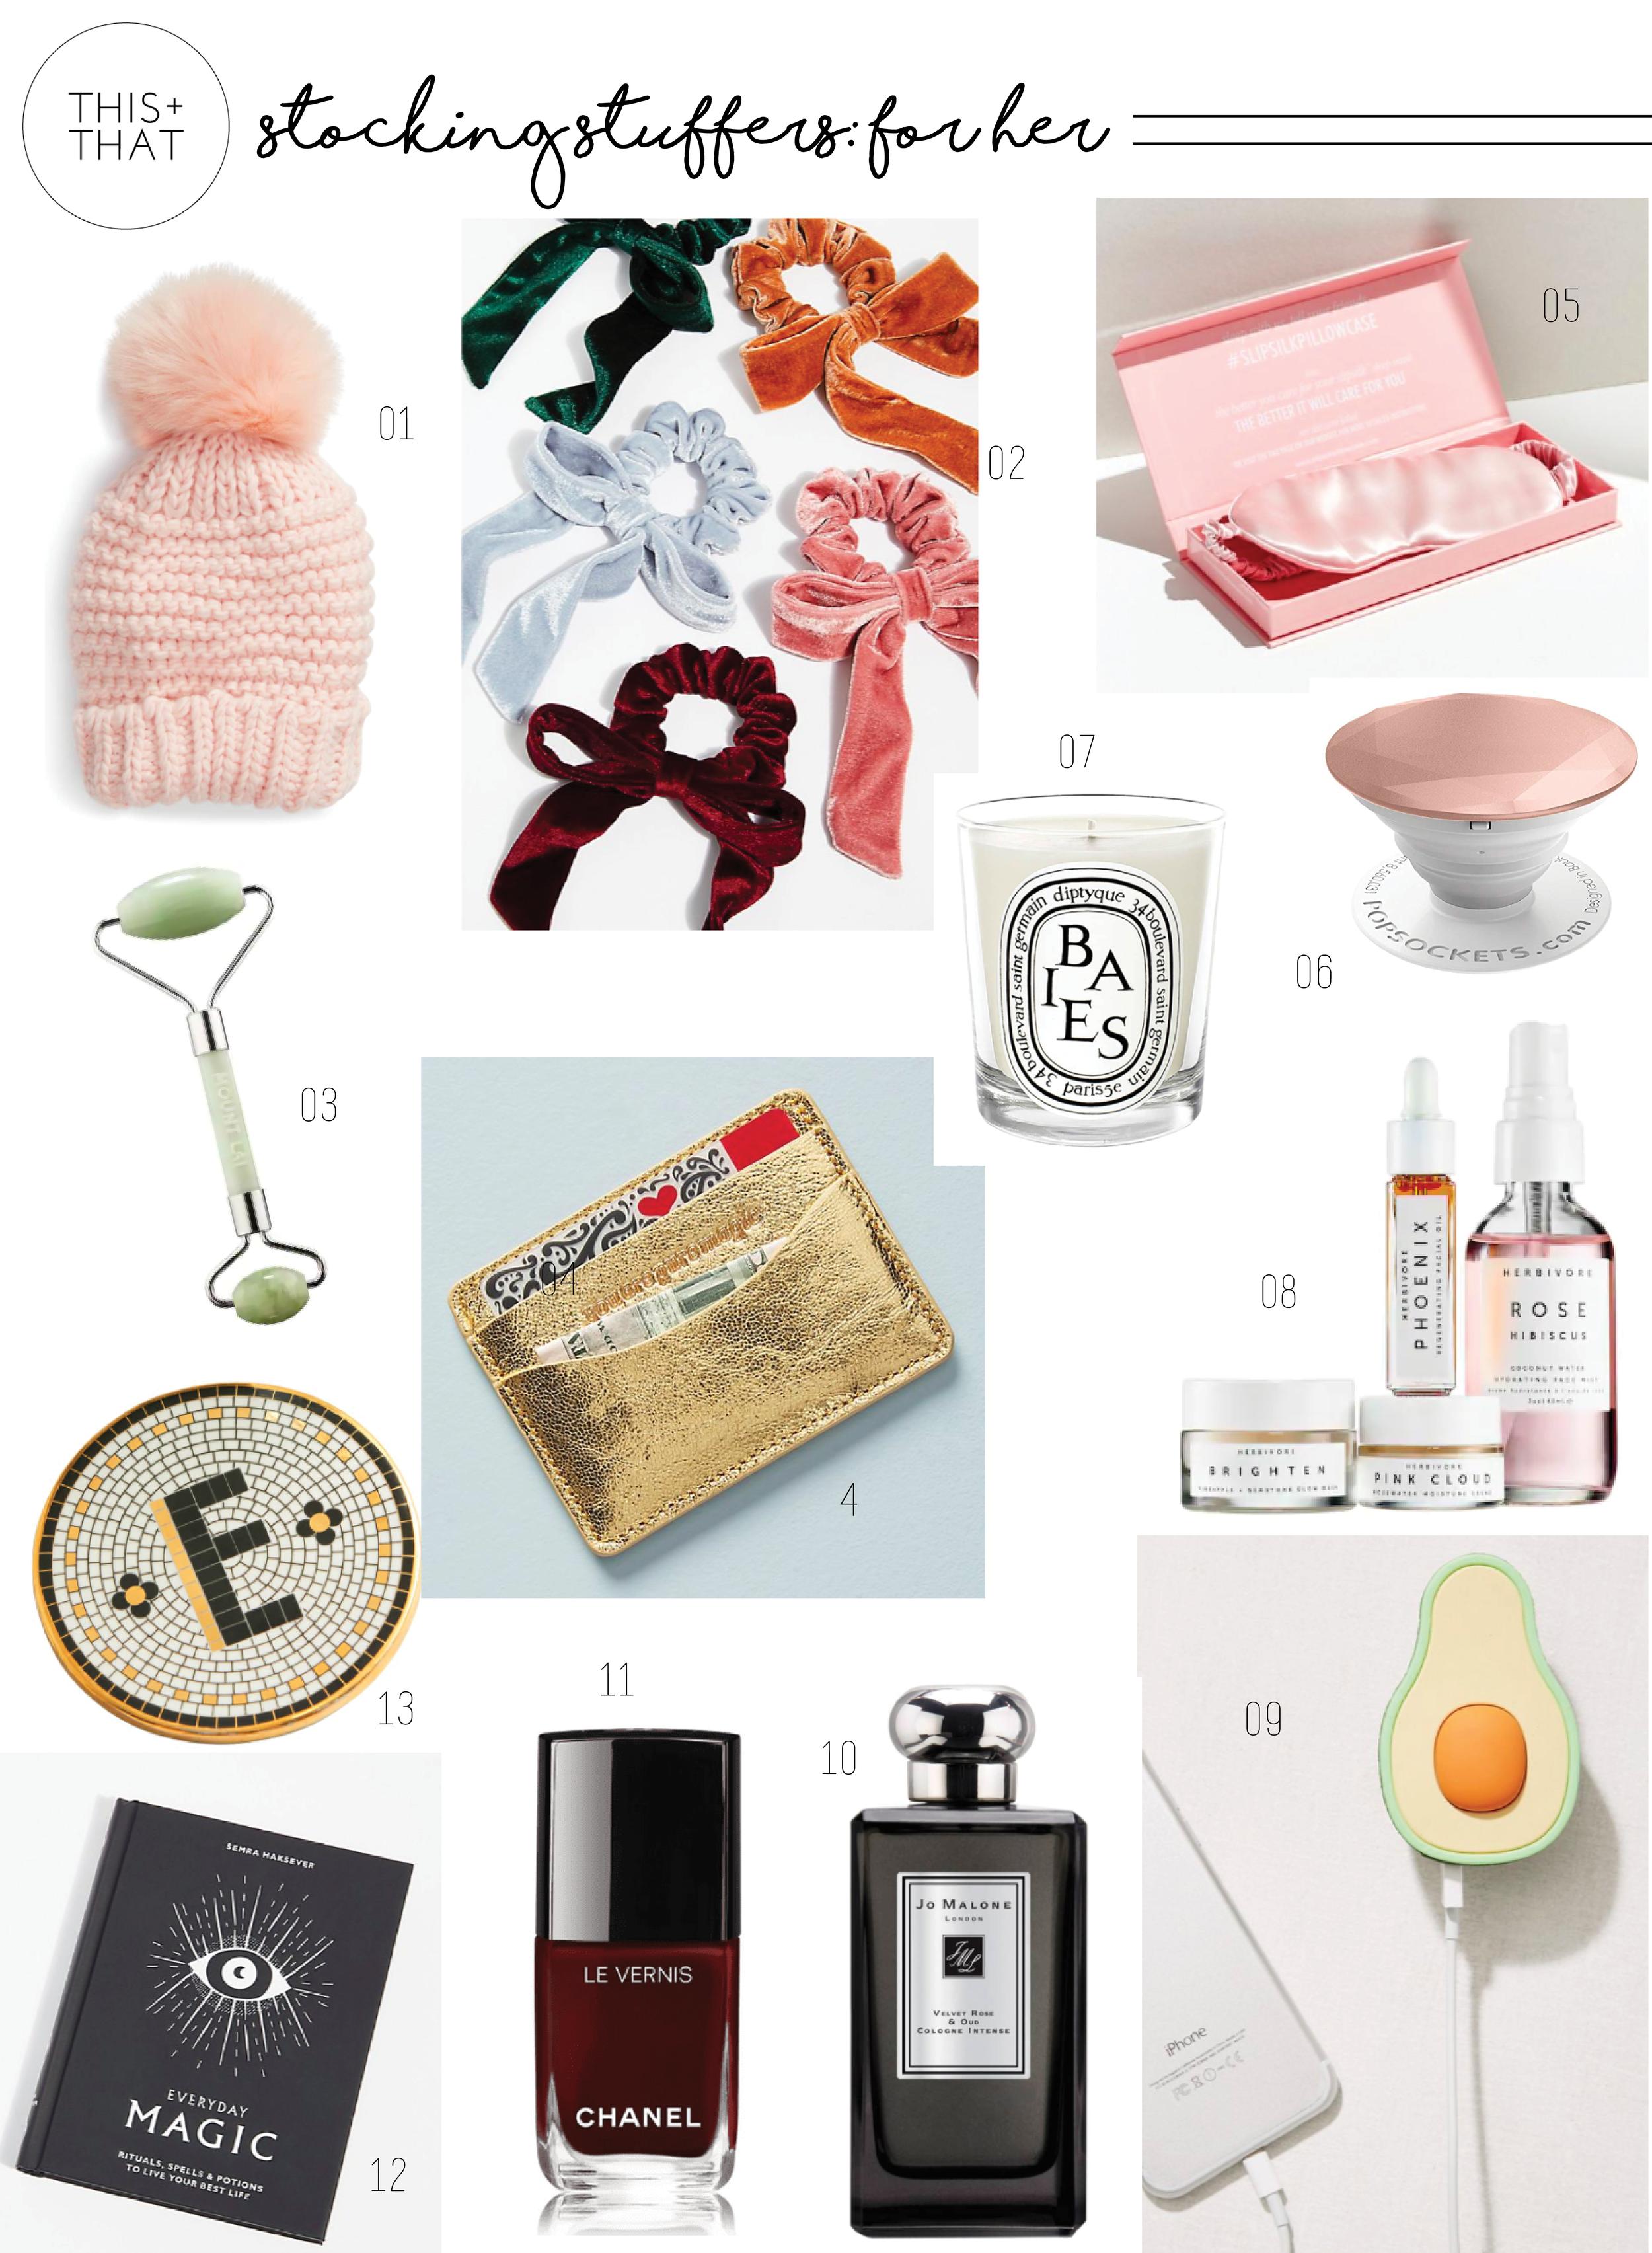 stocking-stuffer-ideas-for-her-women-girls.png